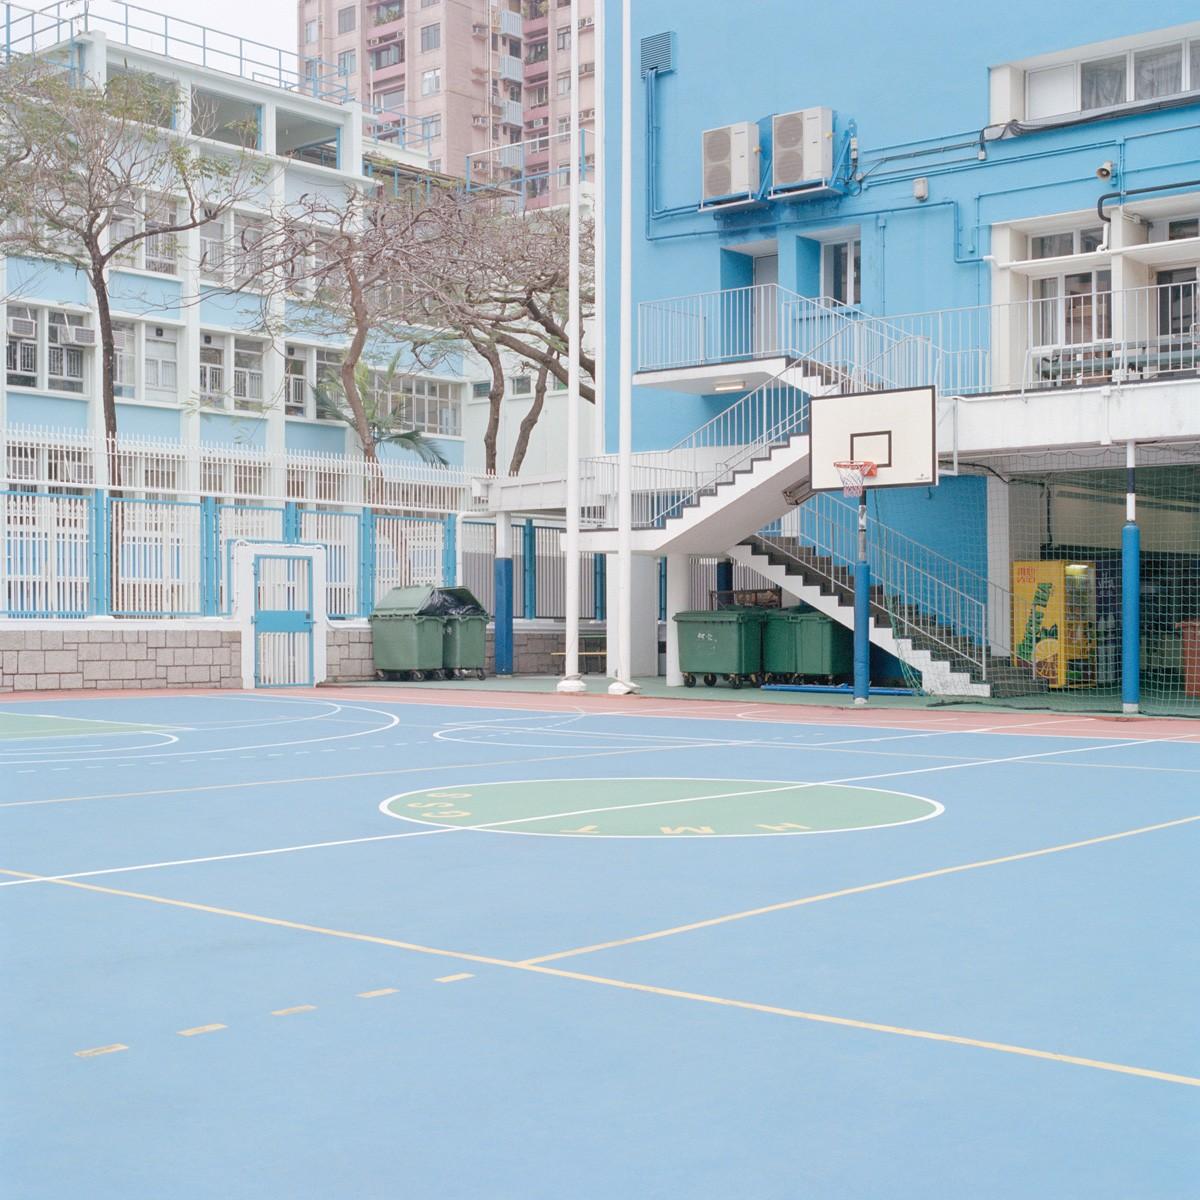 ward-roberts-courts-02.6-a9fa6422e6b5977d6f95bbb3d8b797c4